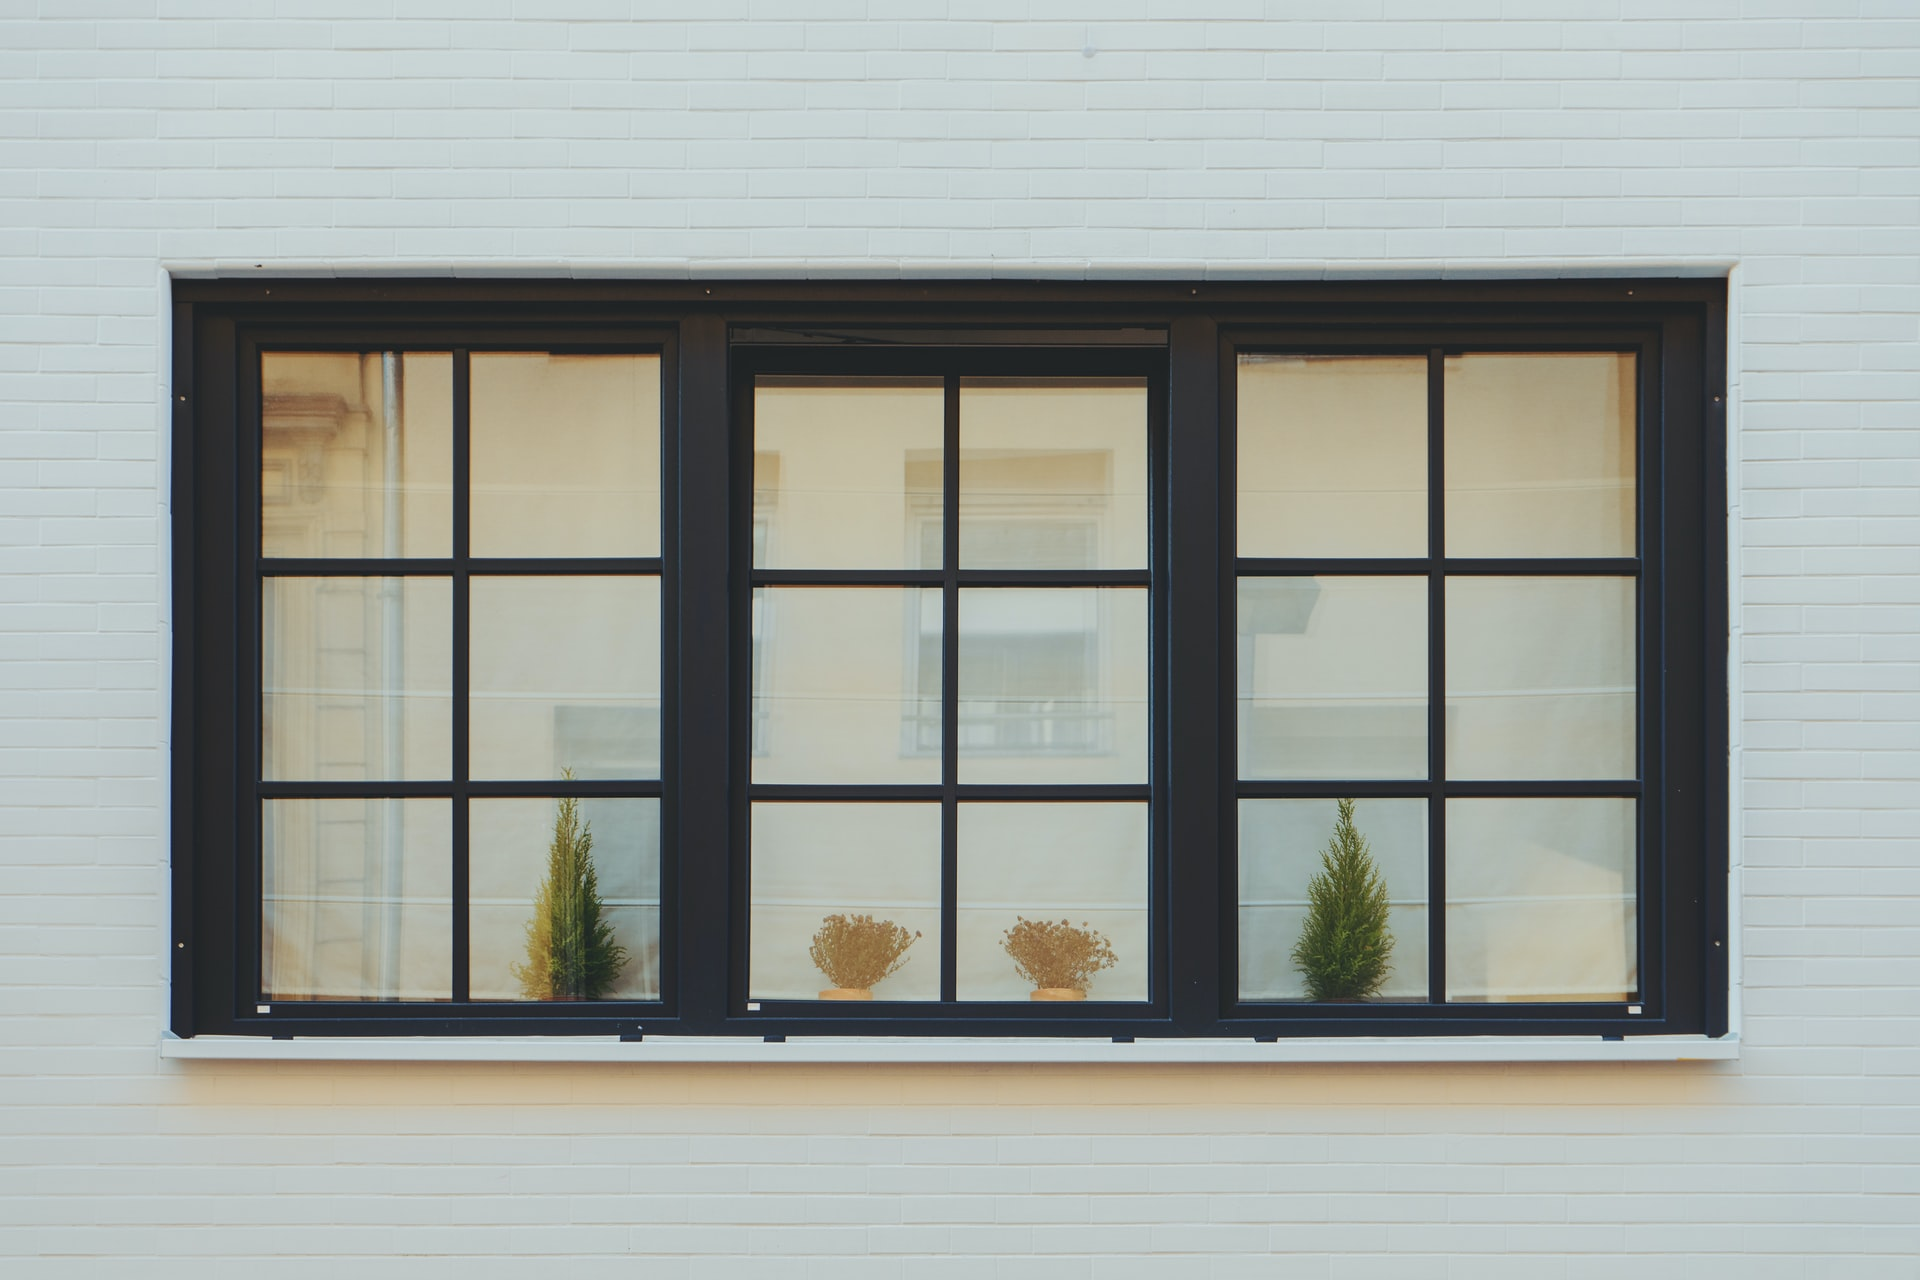 Billig vinduespudser i Solrød Strand